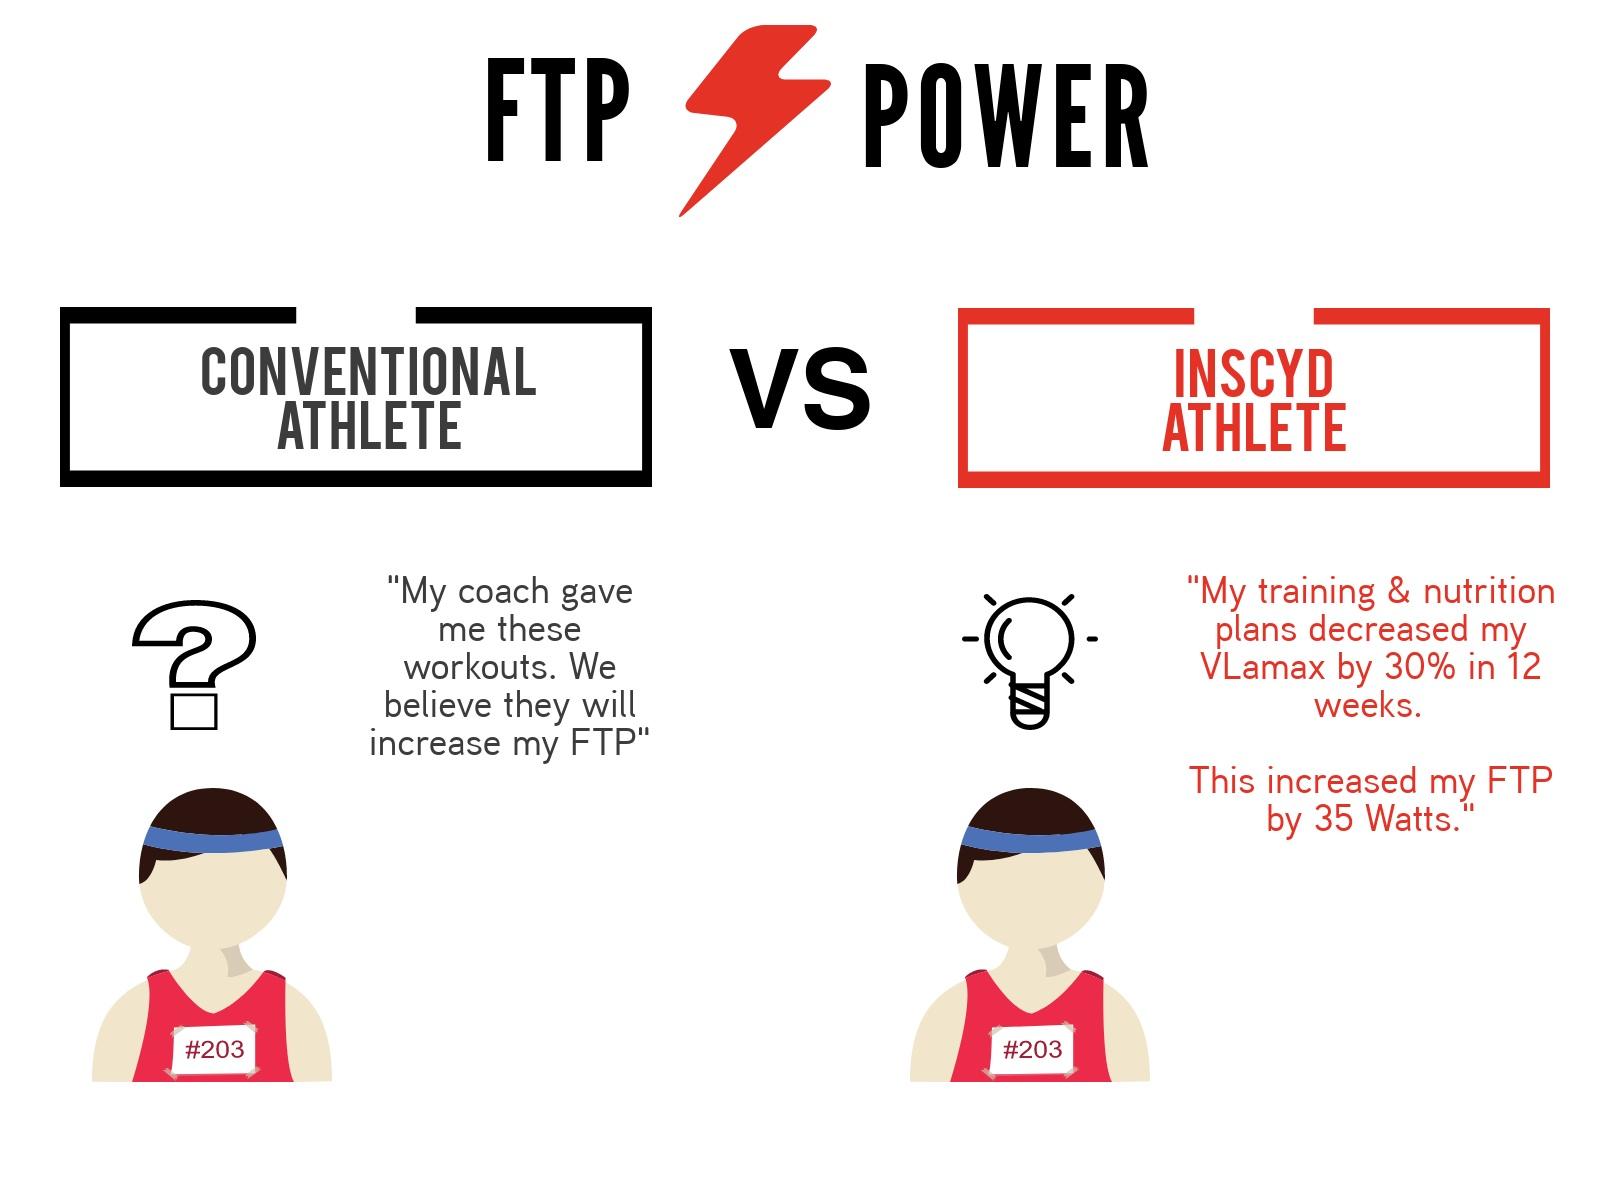 Benefits-Athletes-FTP.jpg